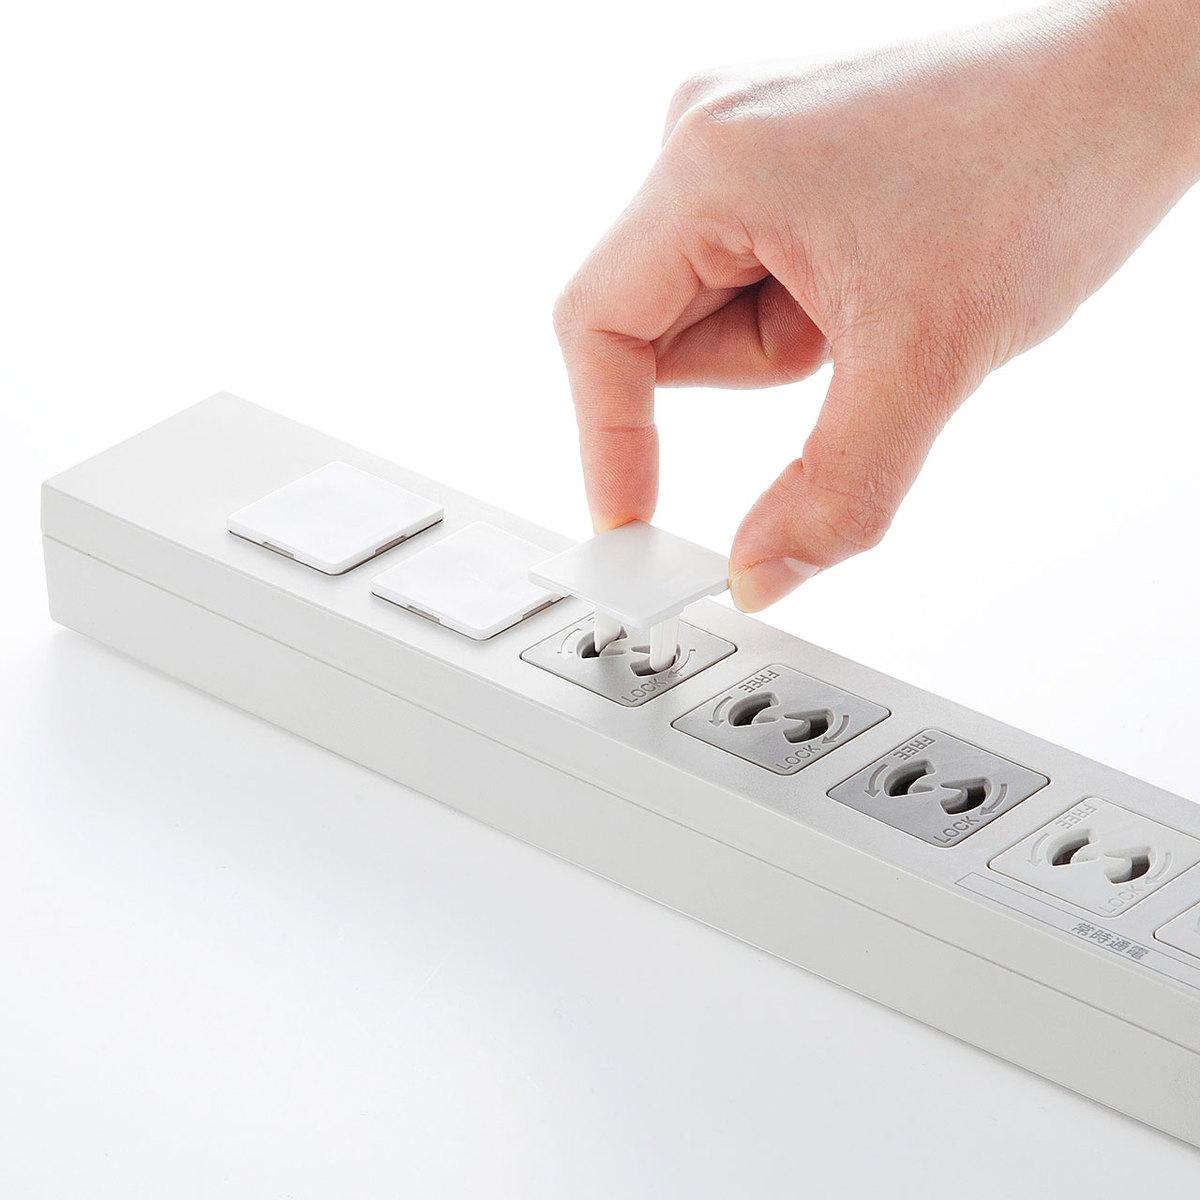 [TAP-CAP2P100L] コンセント安全キャップ 抜け止め用(2P・100個入り)